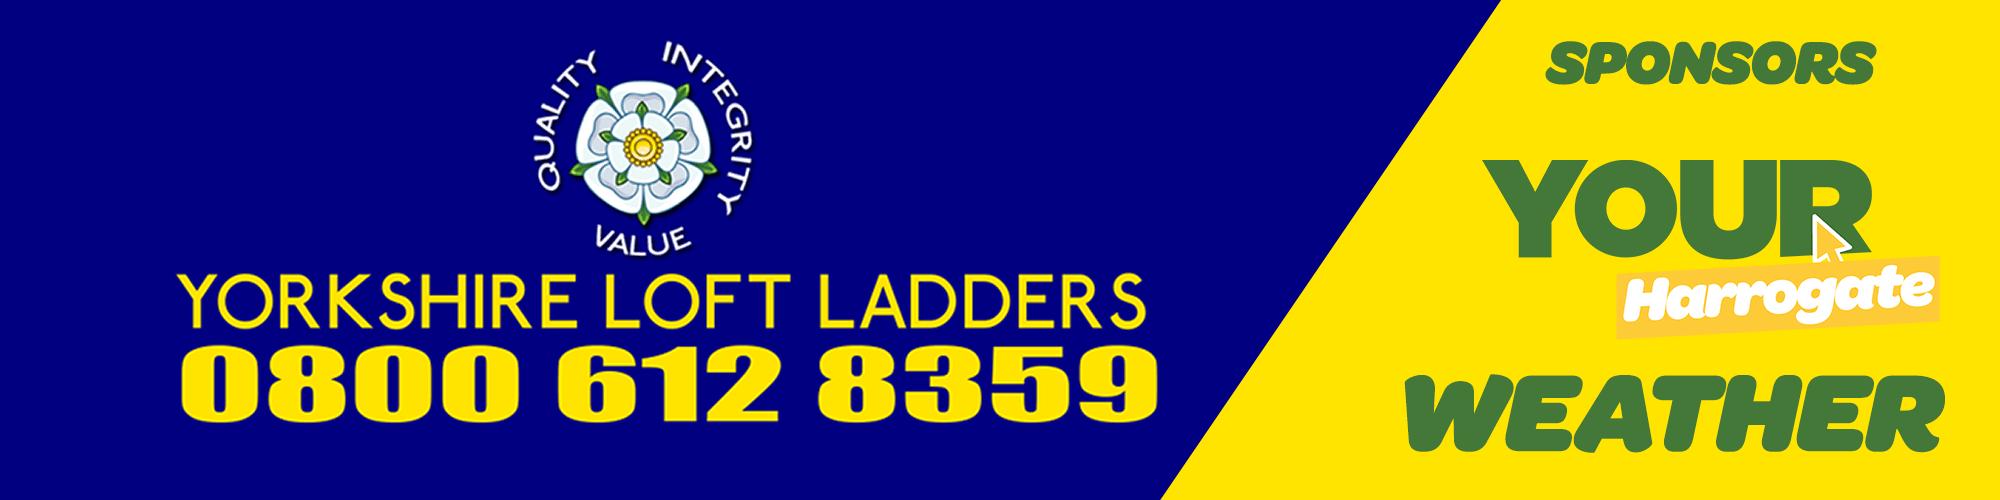 Yorkshire loft ladders